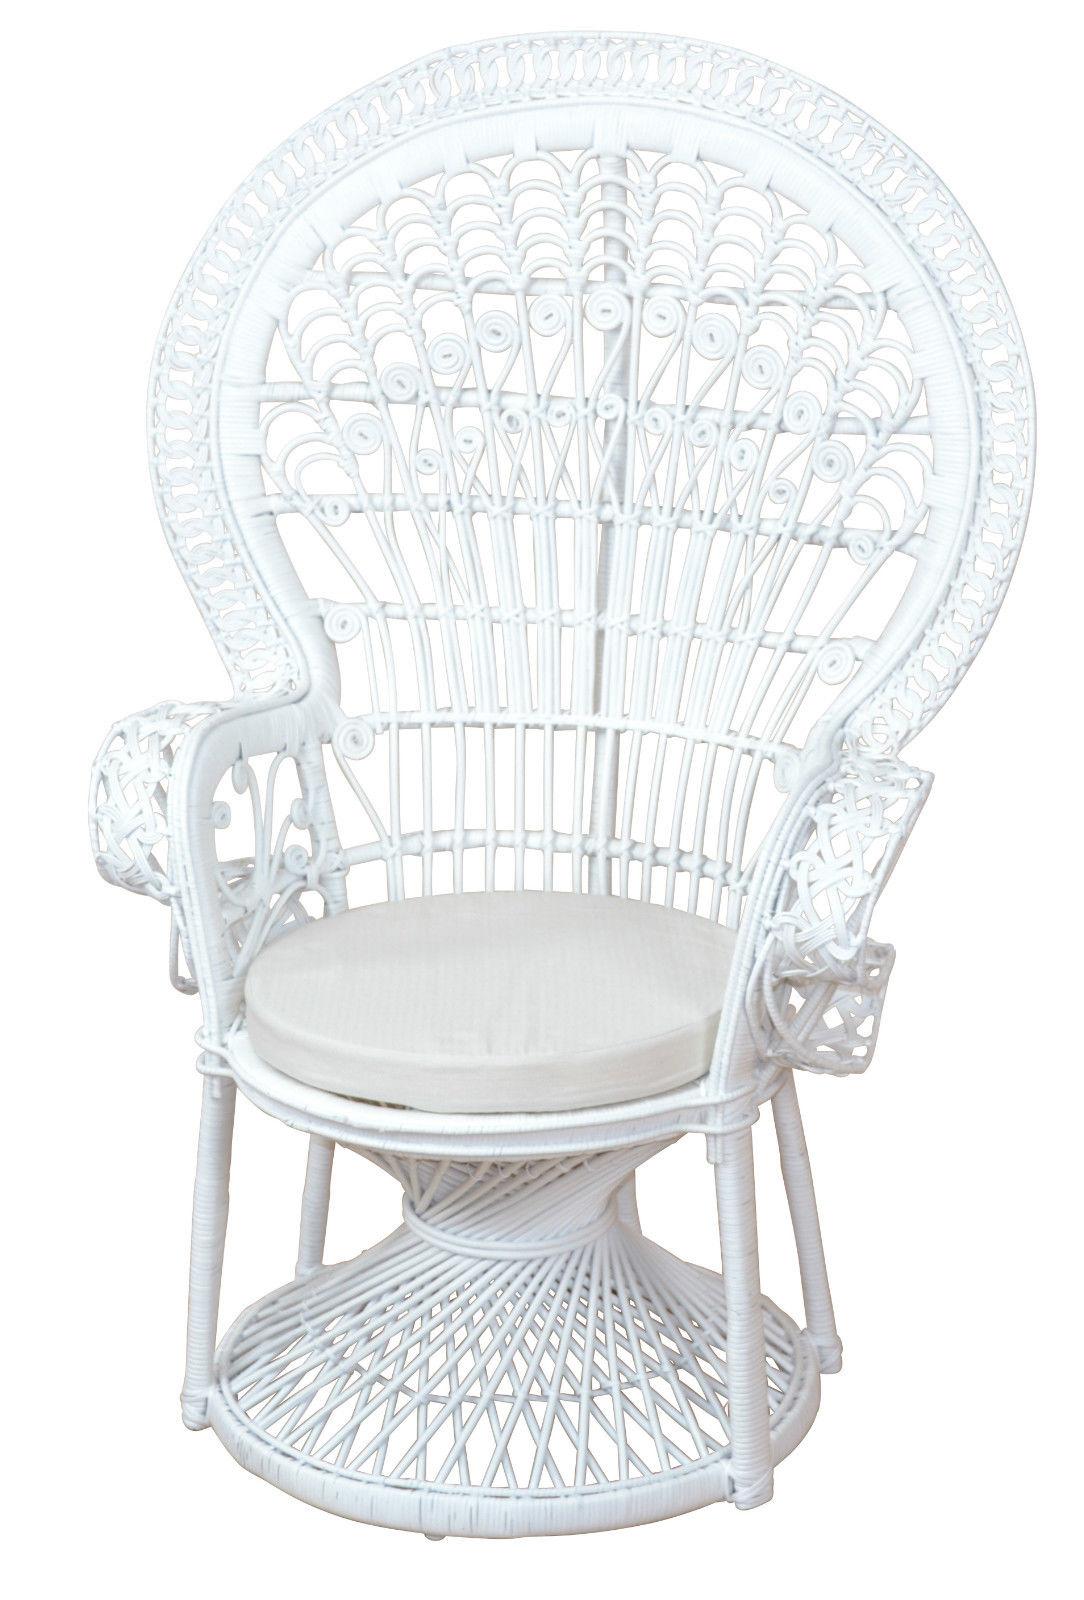 pfauenthron wei rattansessel sessel rattan rattanstuhl. Black Bedroom Furniture Sets. Home Design Ideas